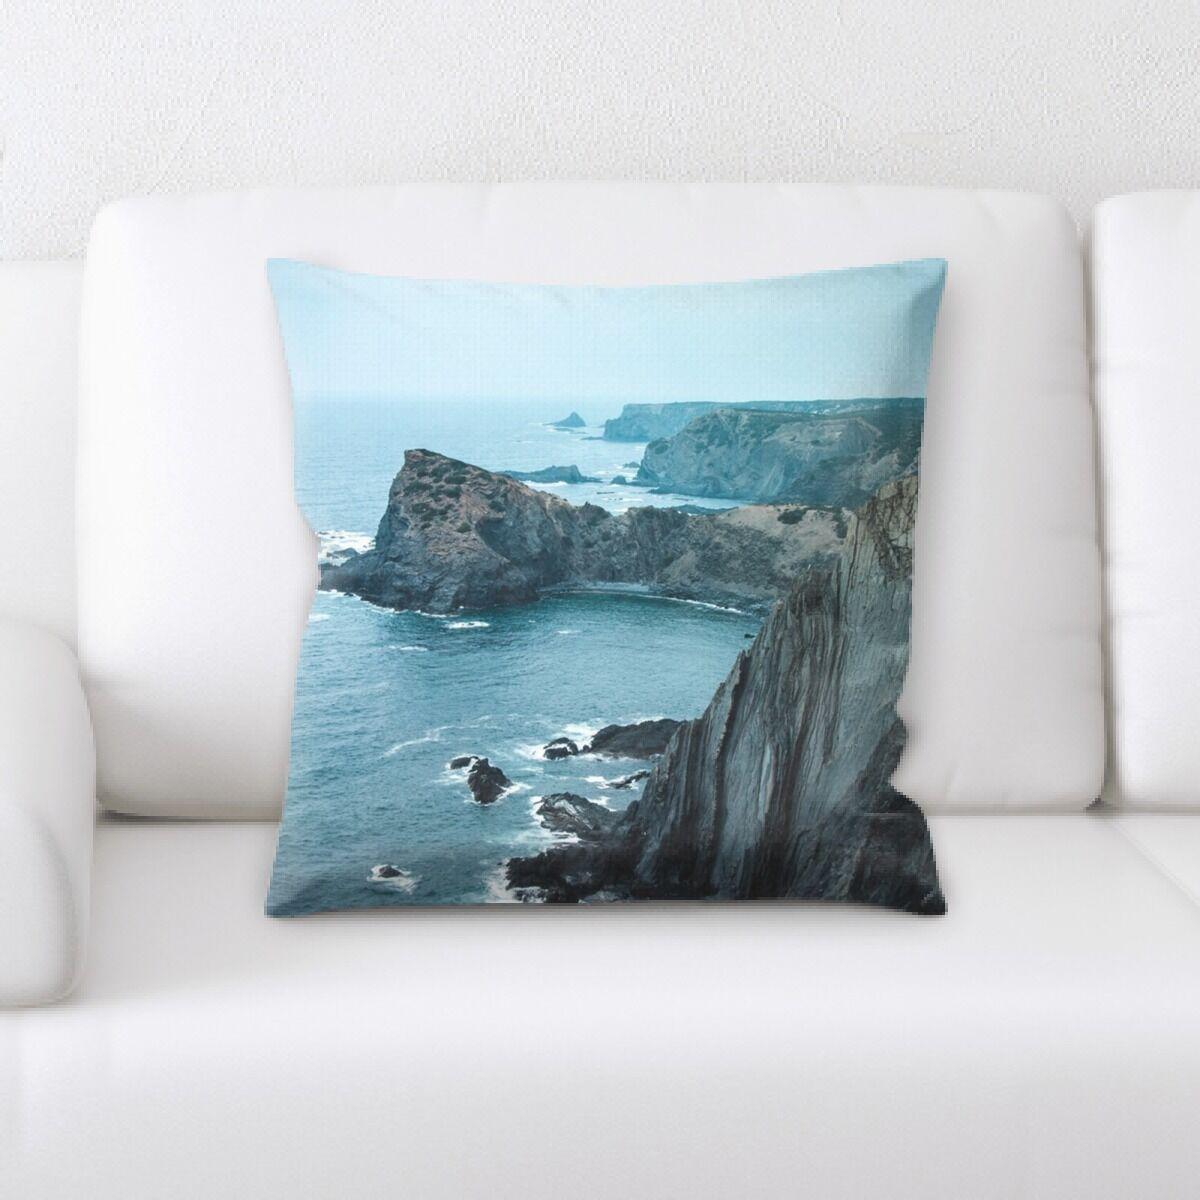 Silliman Mountain and Cliffs (117) Throw Pillow